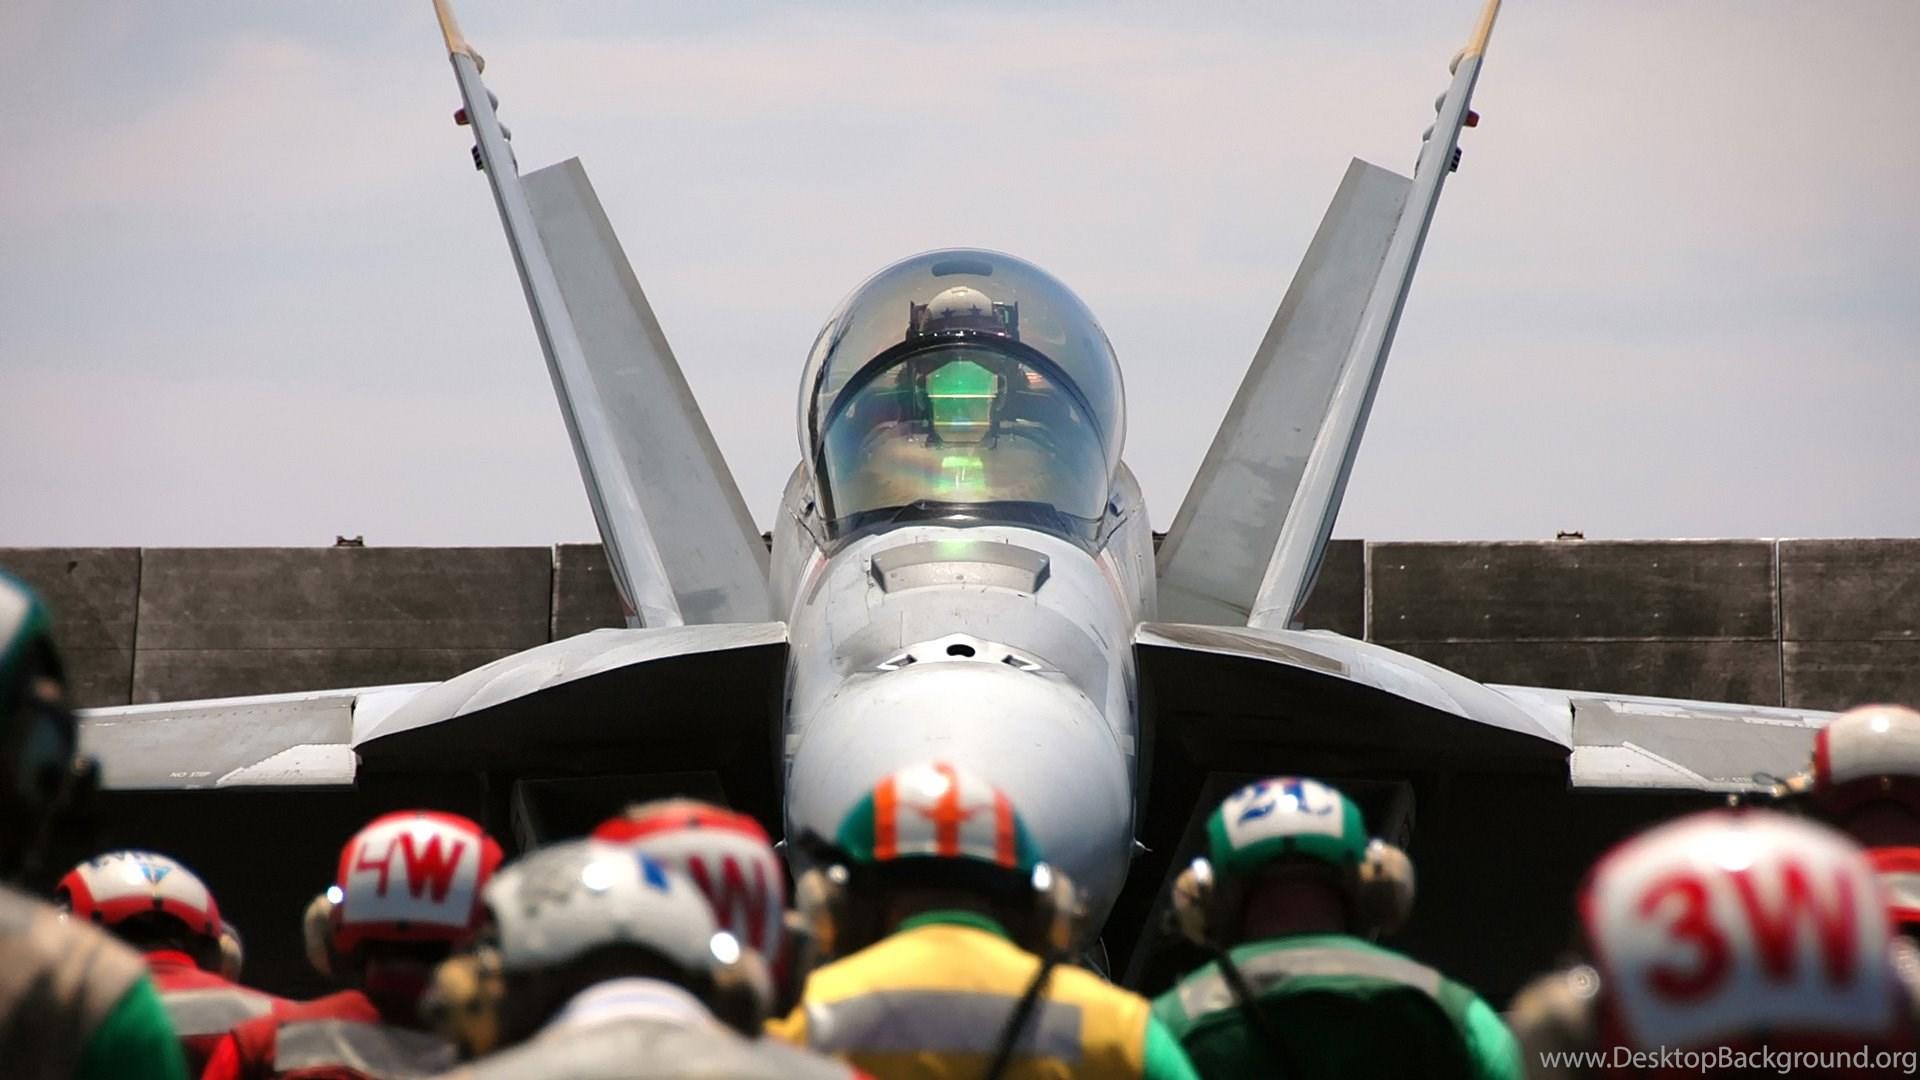 F 18 Super Hornet Wallpapers For Iphone Desktop Background